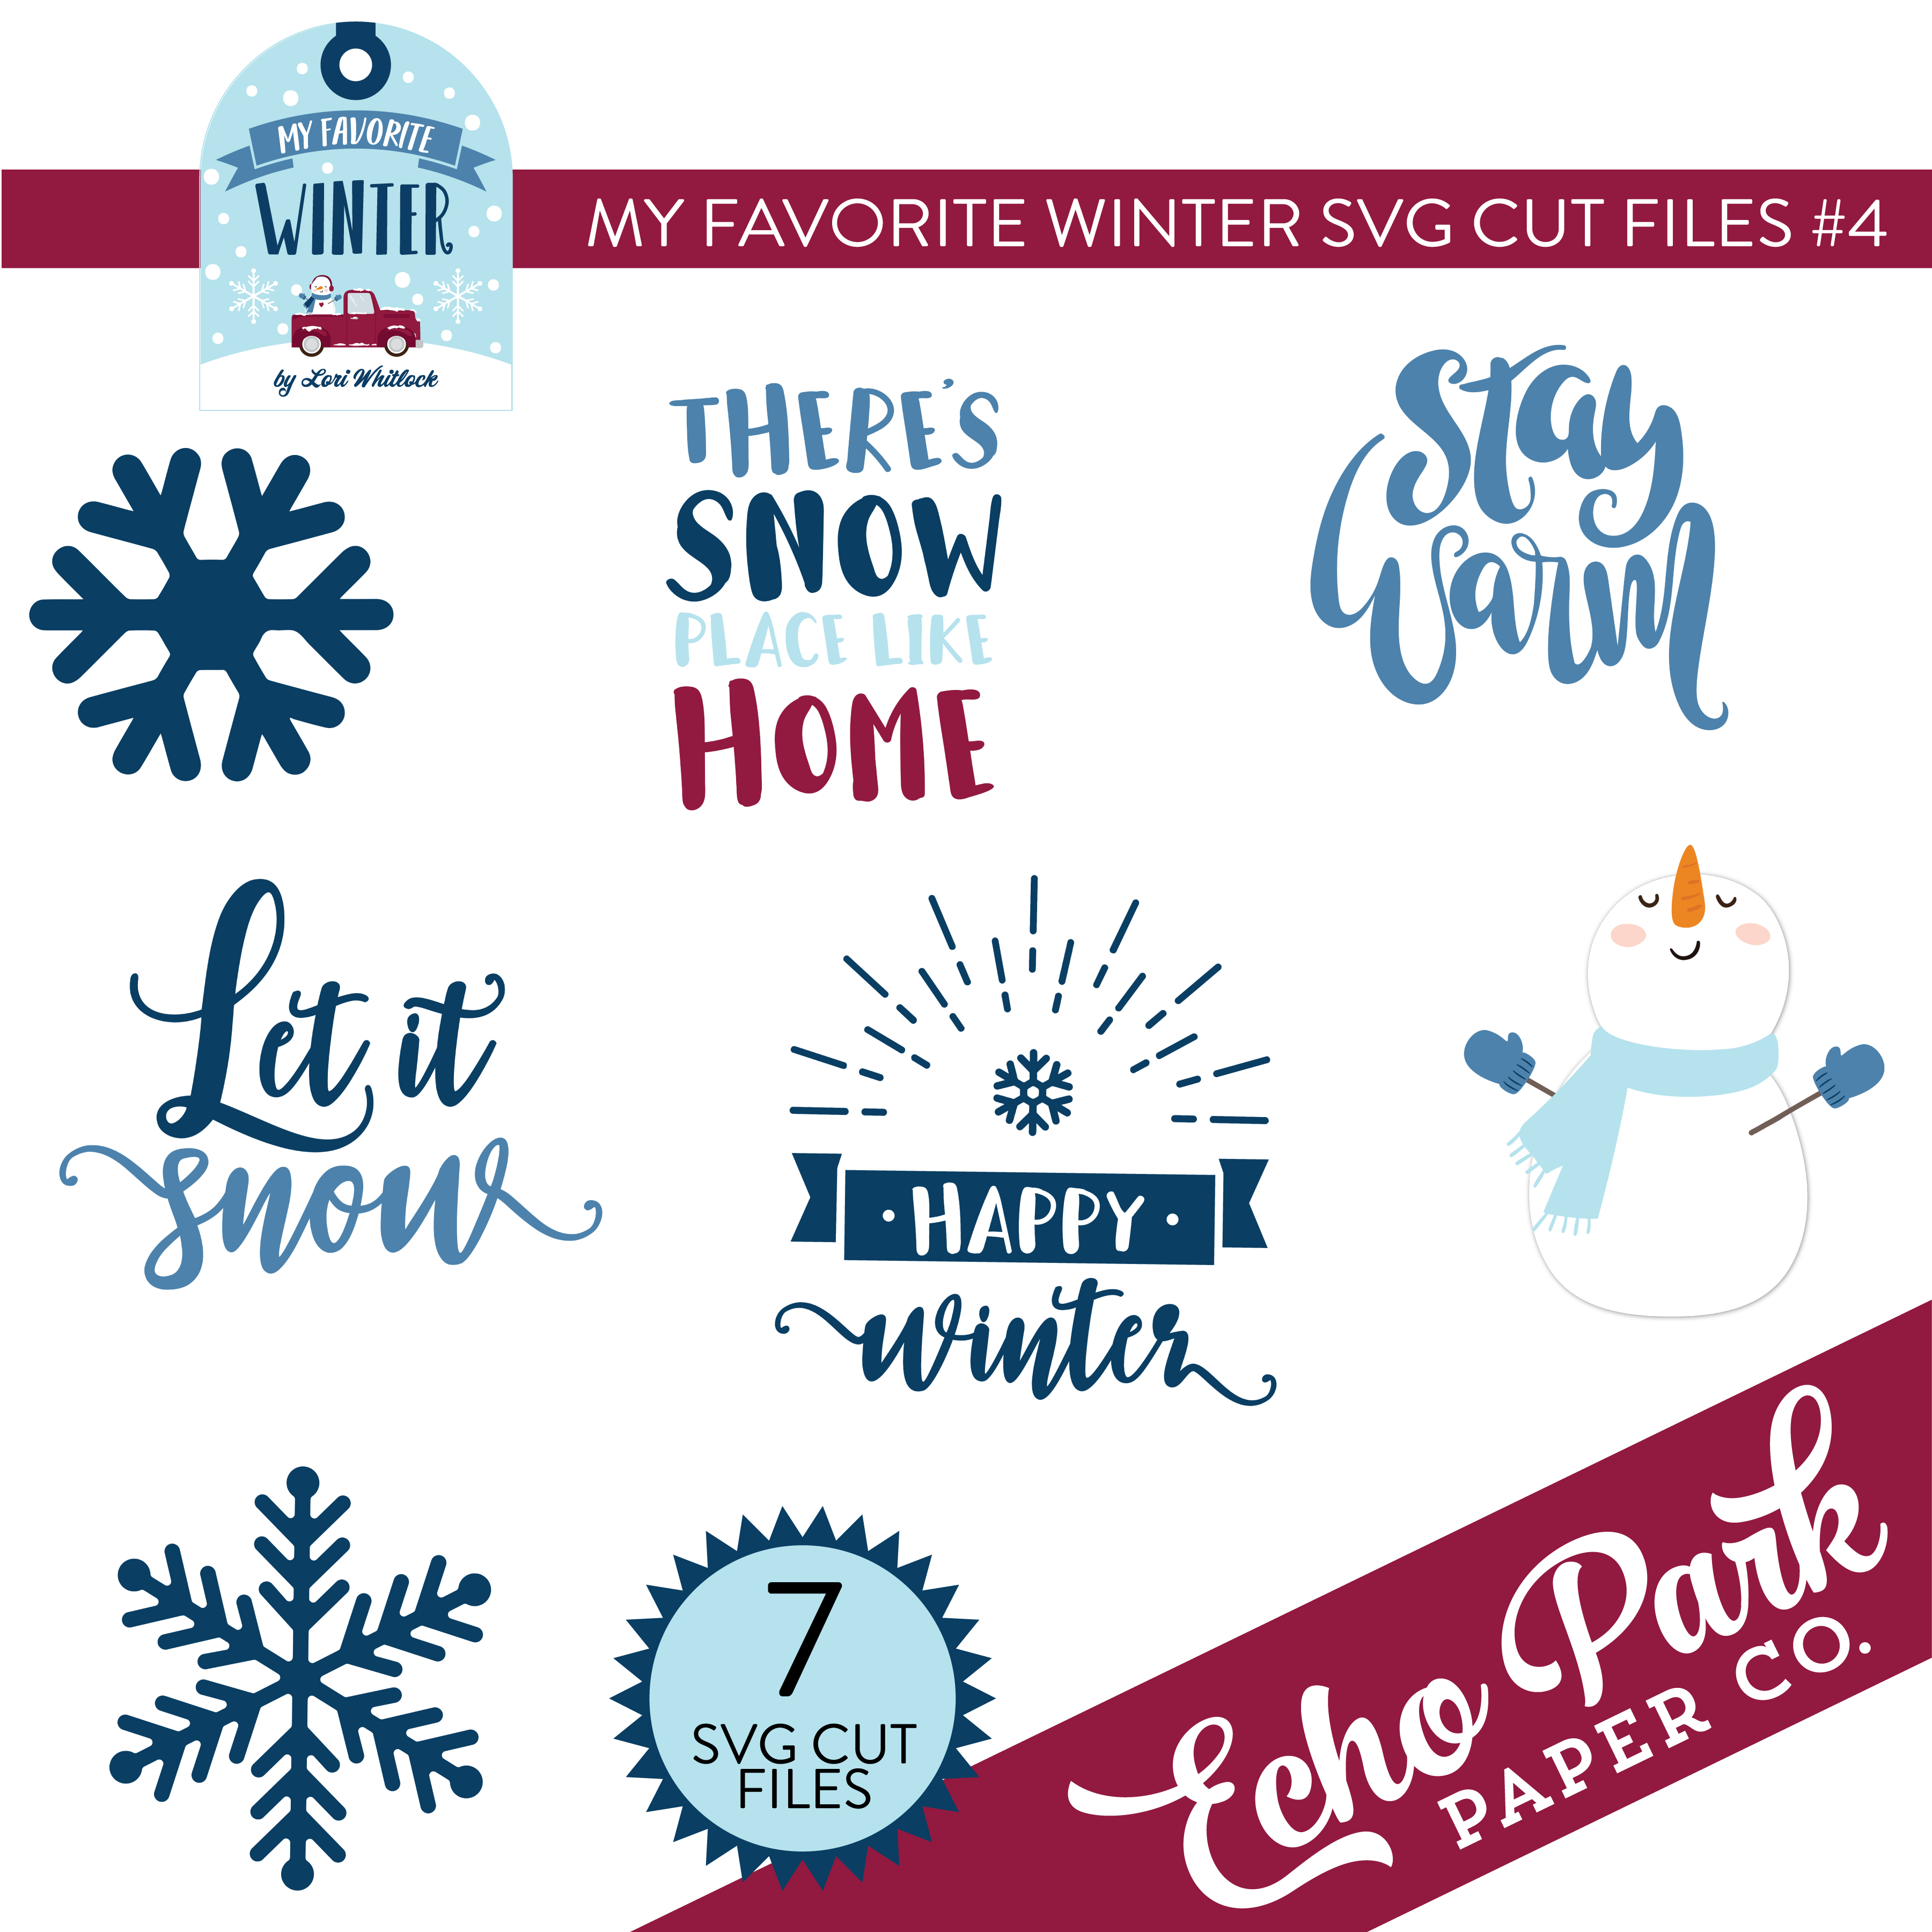 My Favorite Winter SVG Cut Files #4